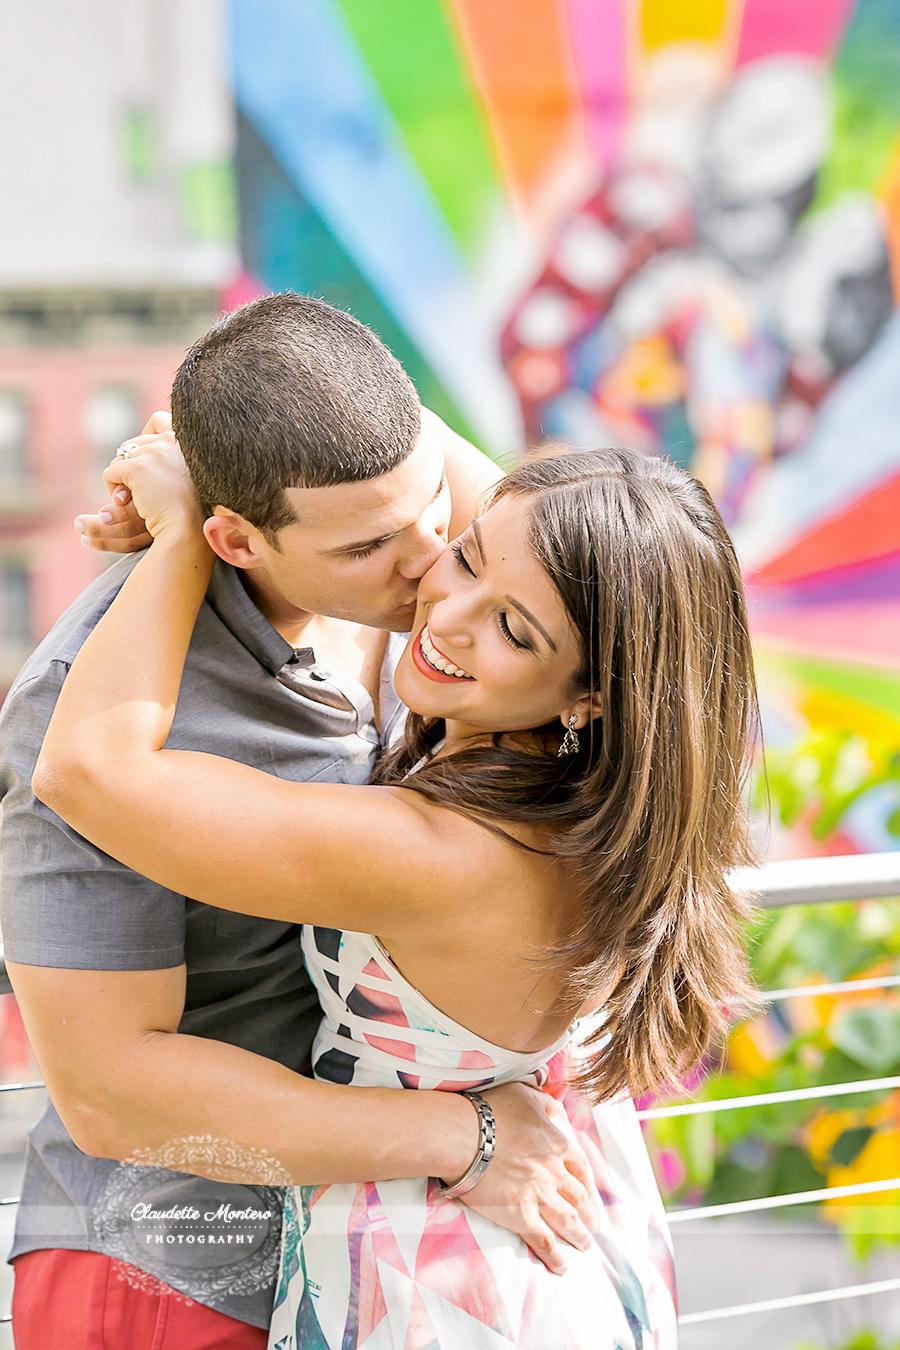 claudette-montero-photography-amaris-emmanuel-new-york-engagement-session-yaska-crespo-wedding-planner-web-logo-9450